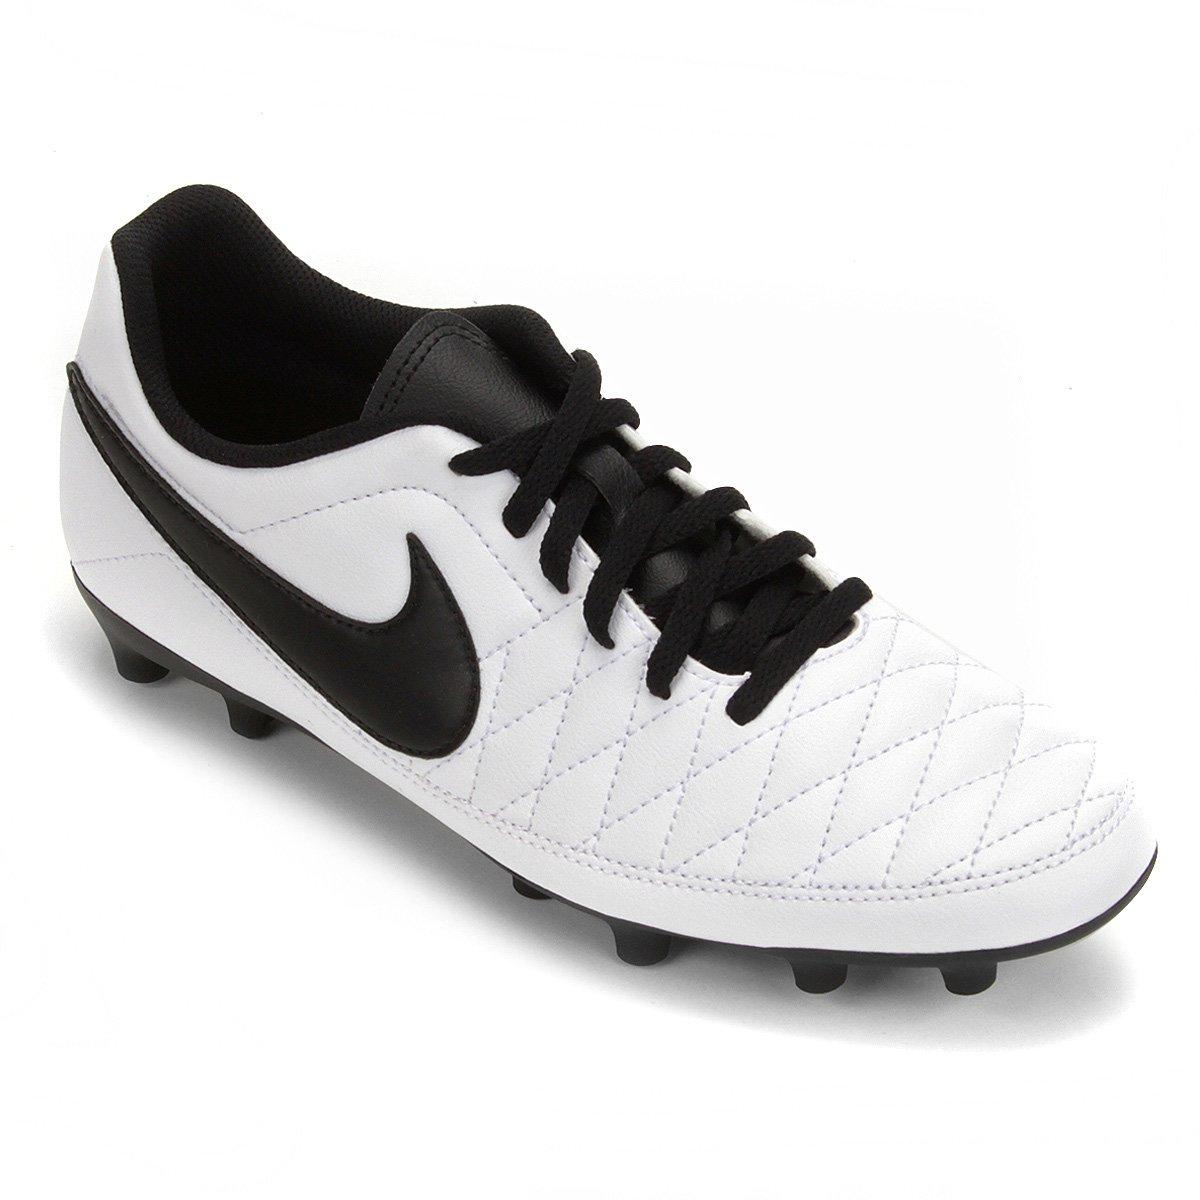 ... Chuteira Campo Nike Majestry FG Masculina - Branco e Preto - Compre ...  f6649cc809796a ... eef5355f56ec1